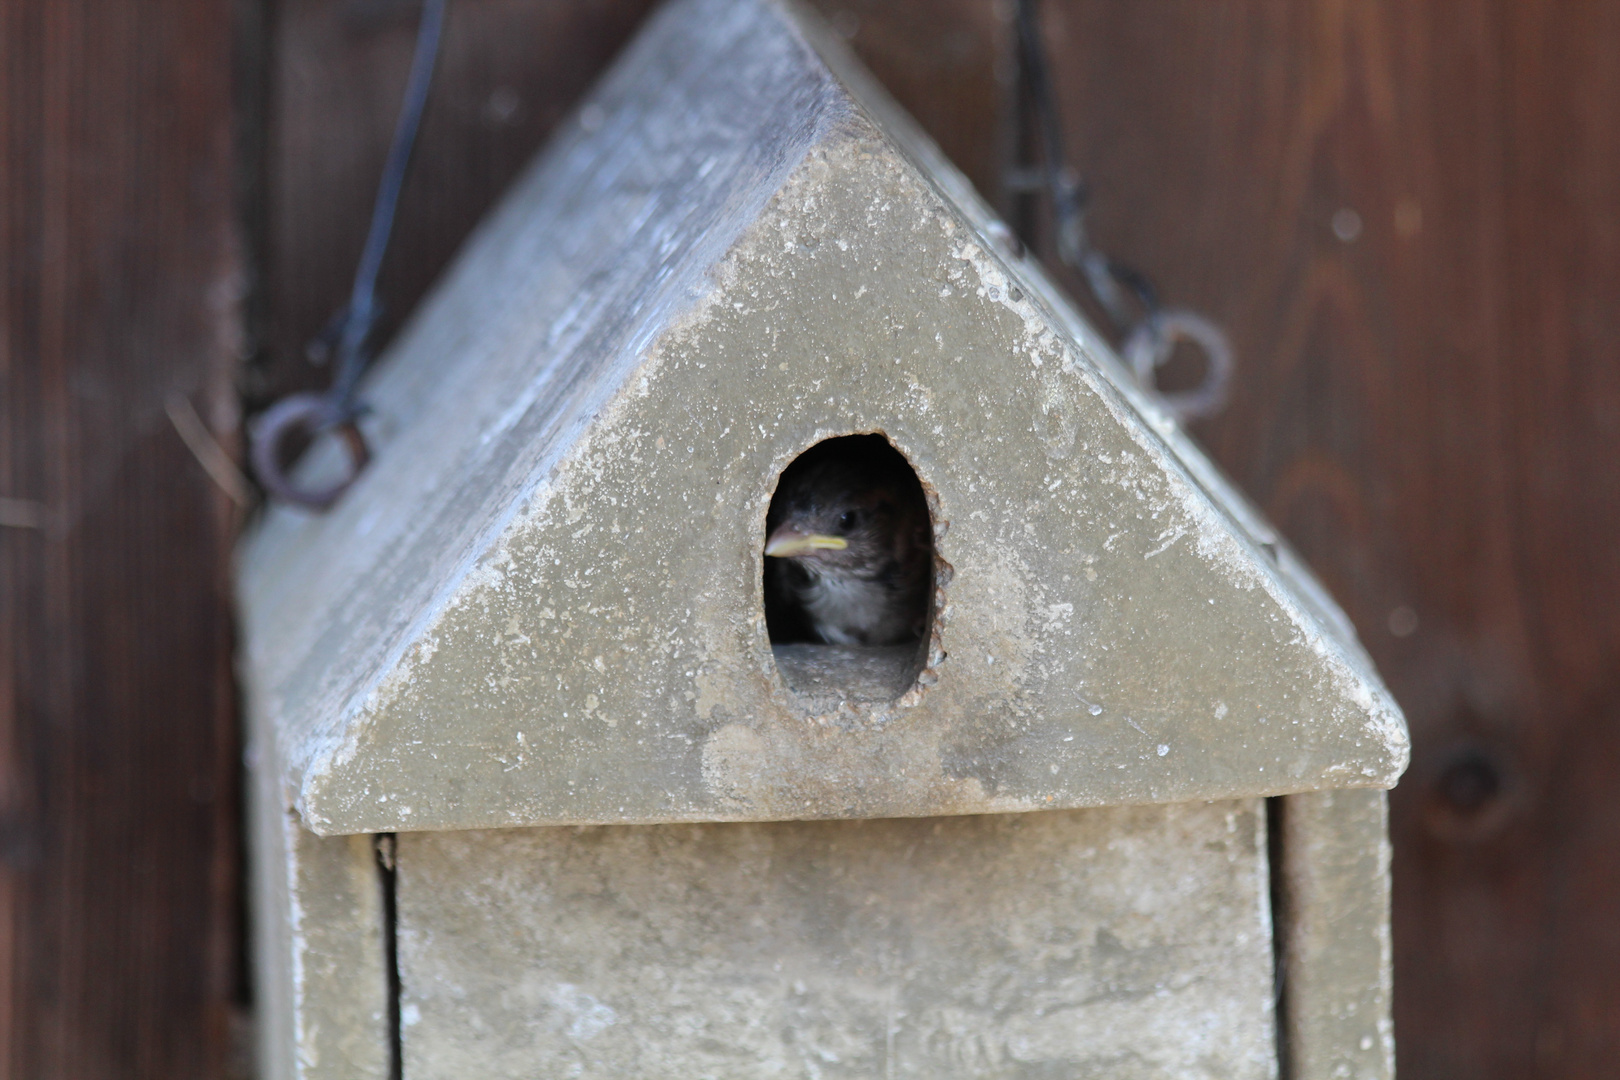 Sperlingsvögelchen